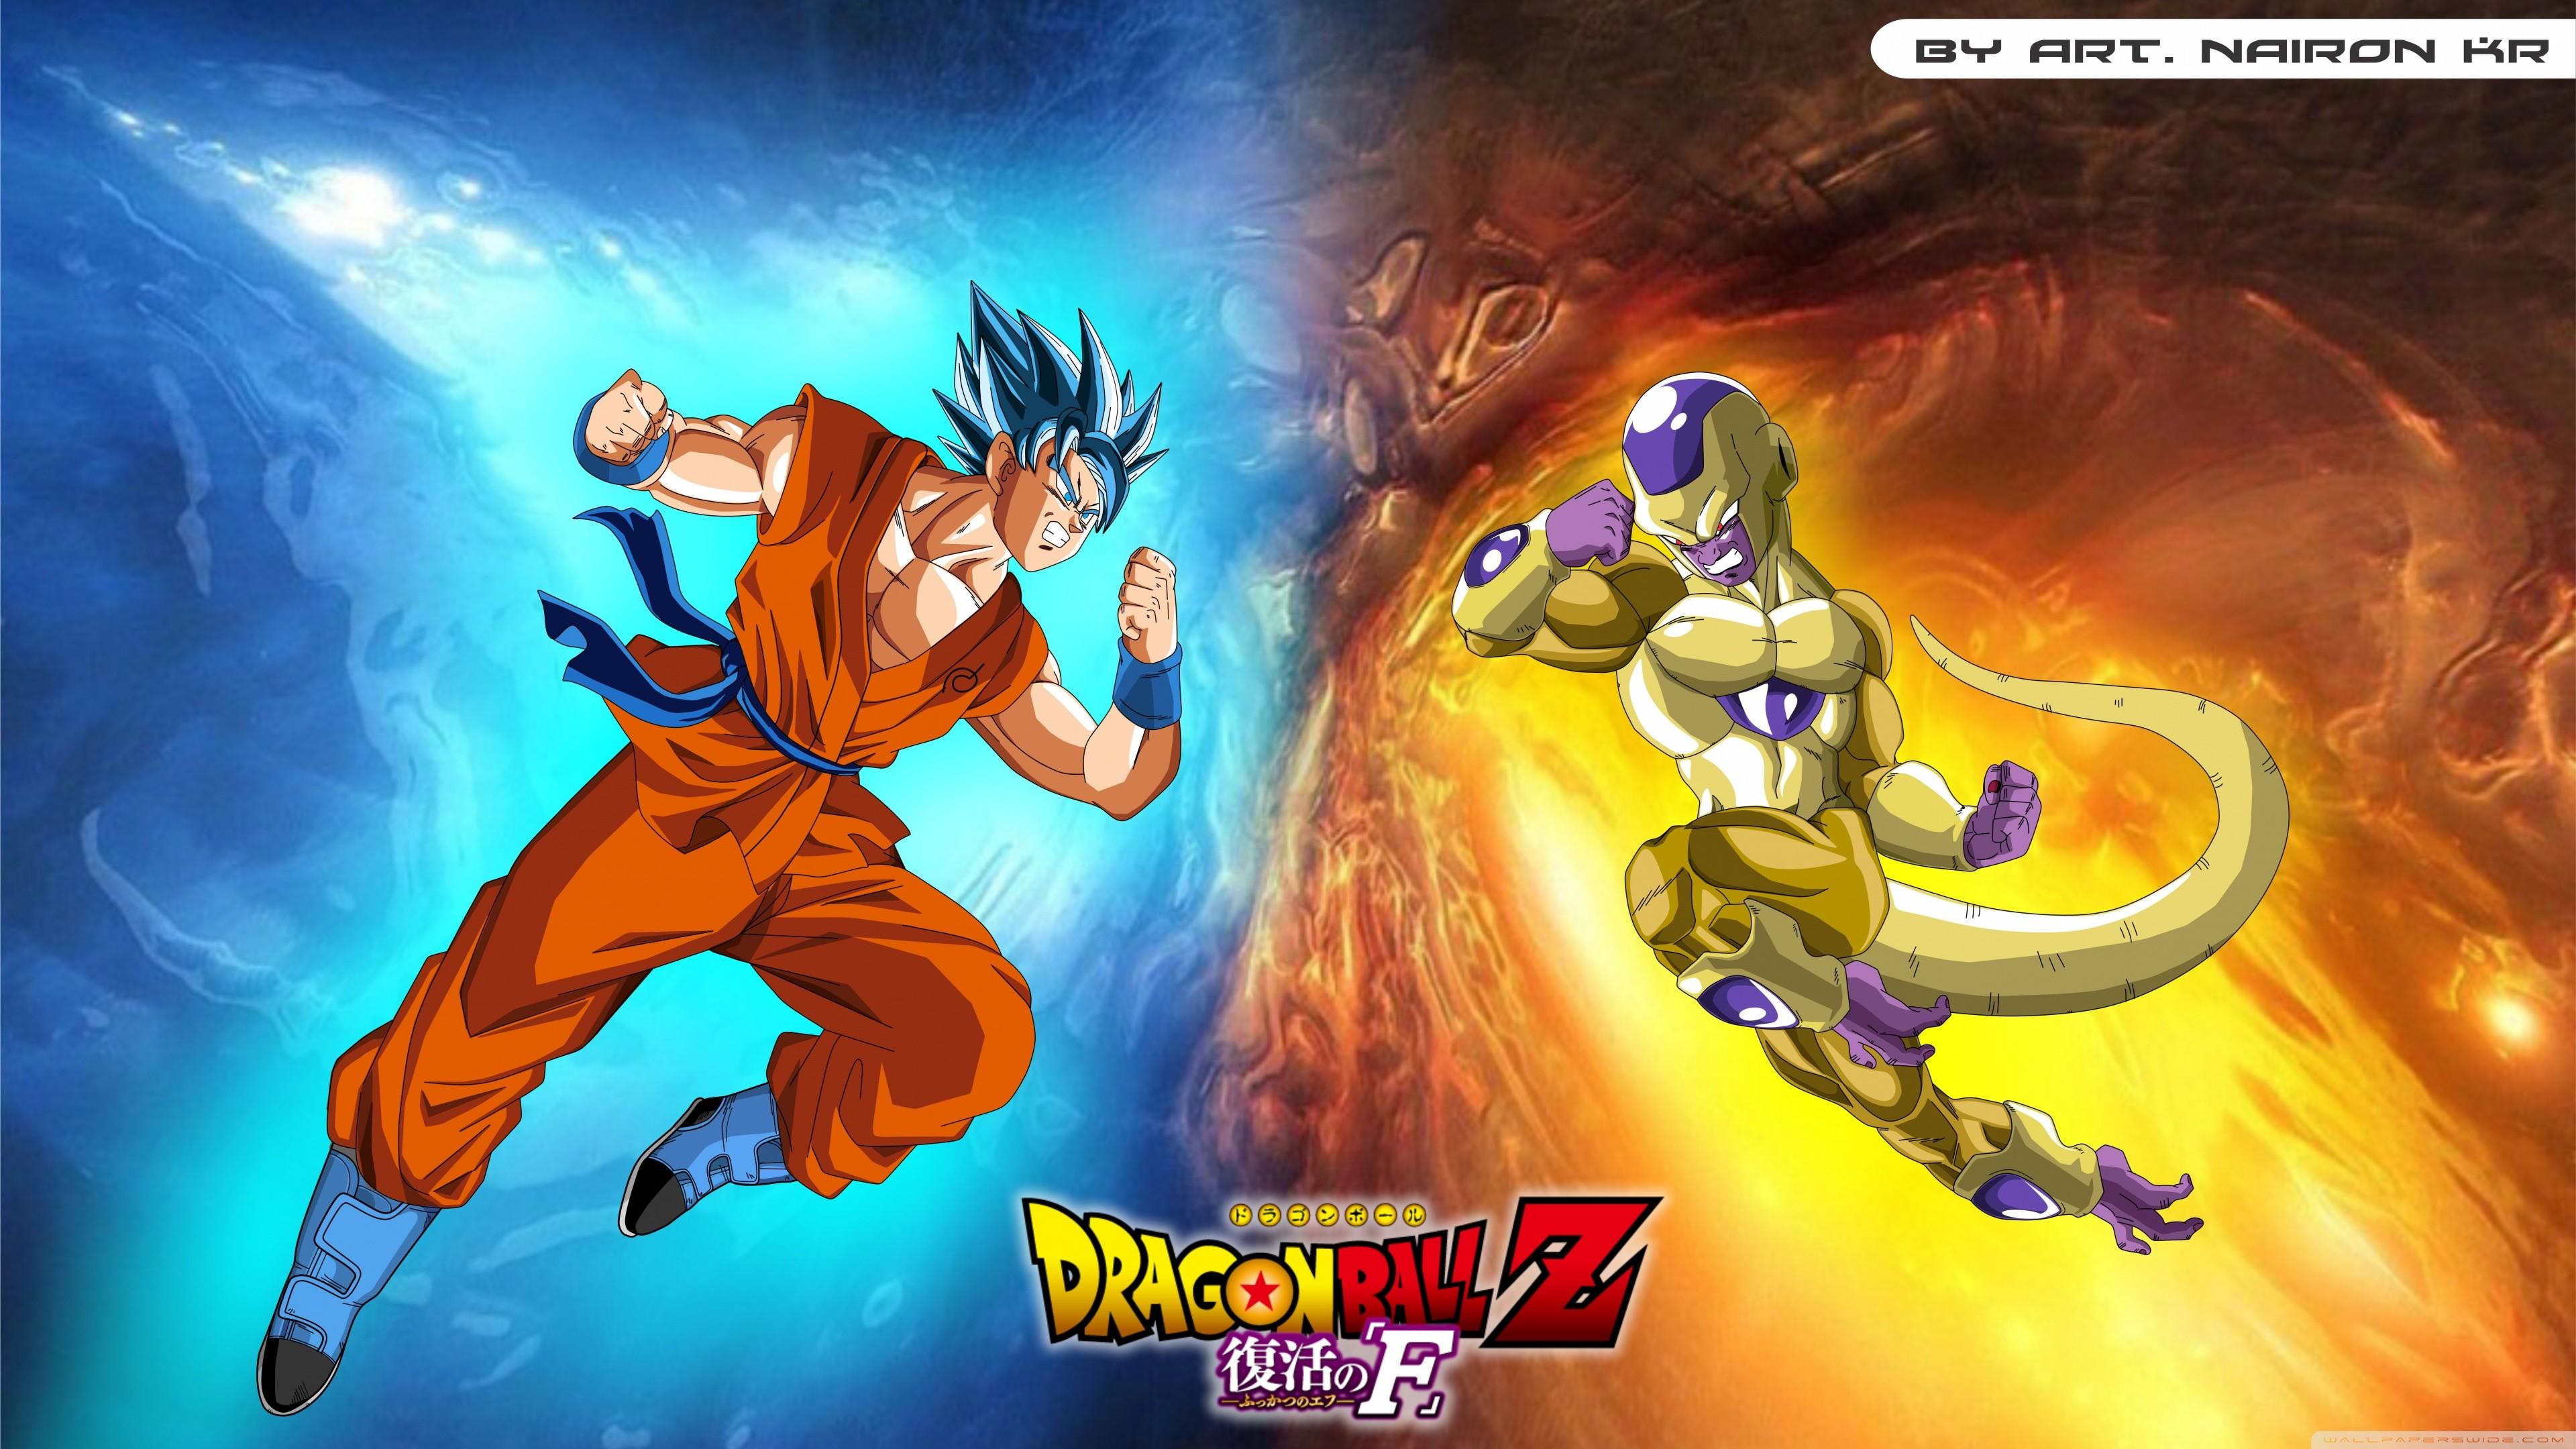 4K Dragon Ball Z Wallpaper (60+ Images